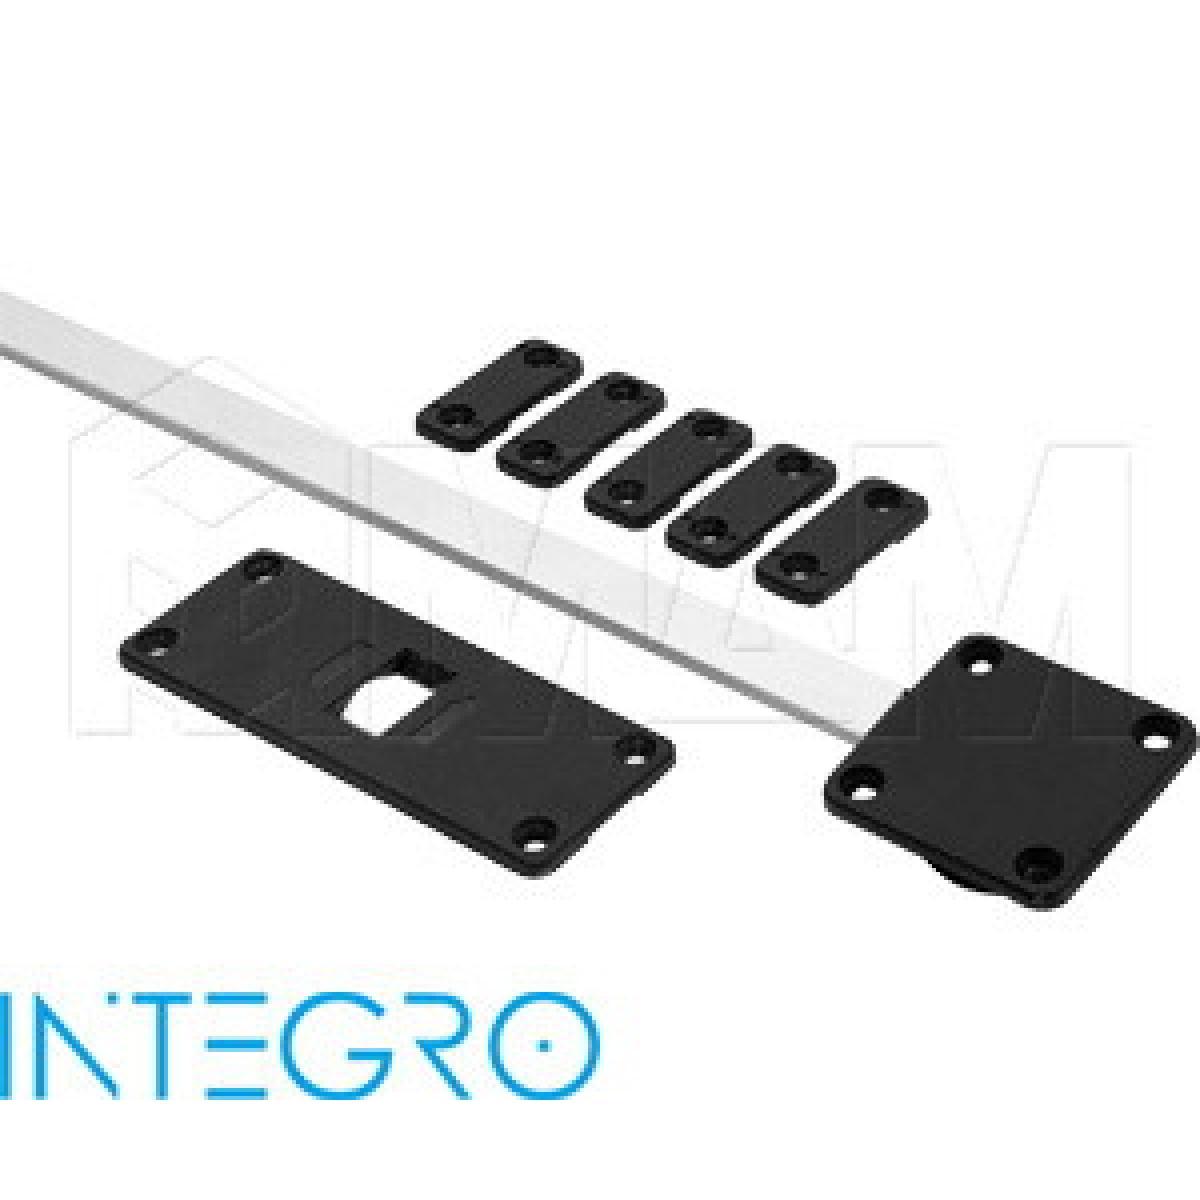 INTEGRO Корректор фасада, врезной, регулировка по середине, L 1200-2300 мм, компл. на 1 дв.